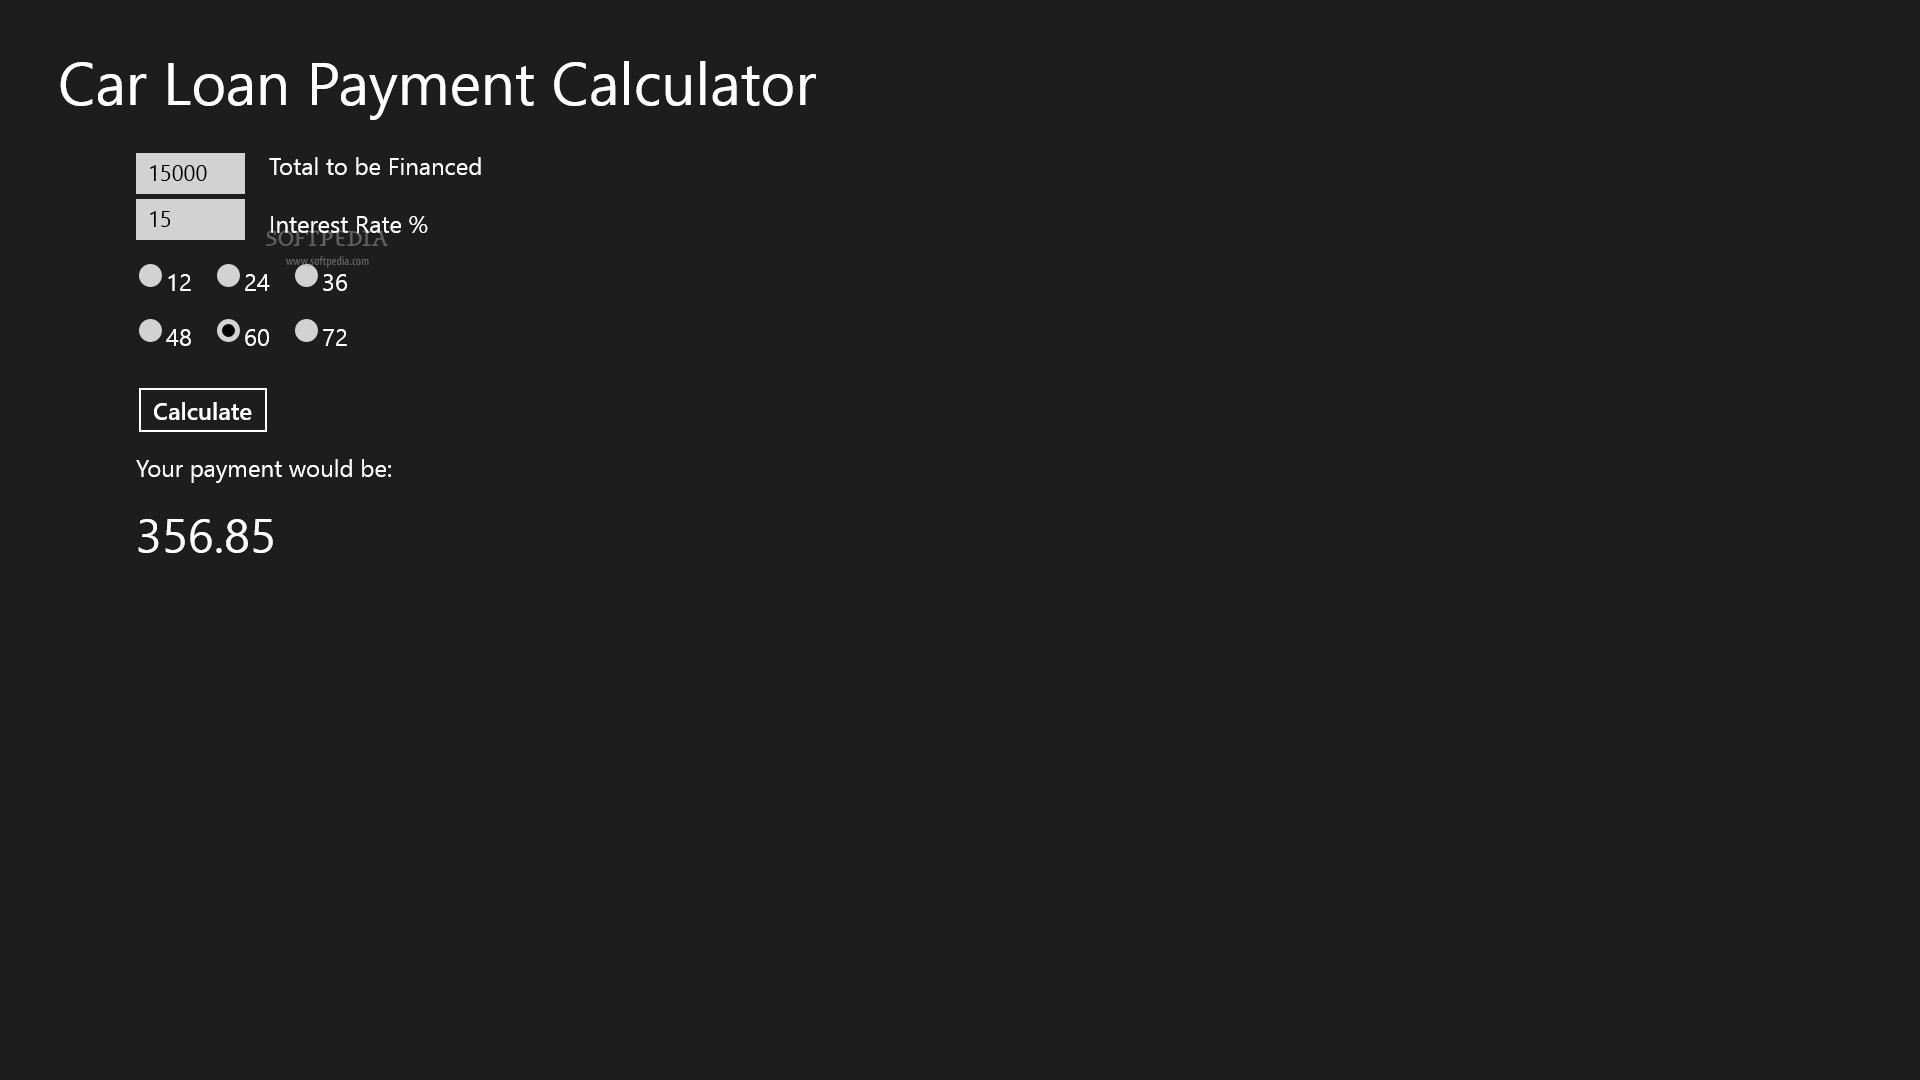 download car loan payment calculator 1 0 0 0